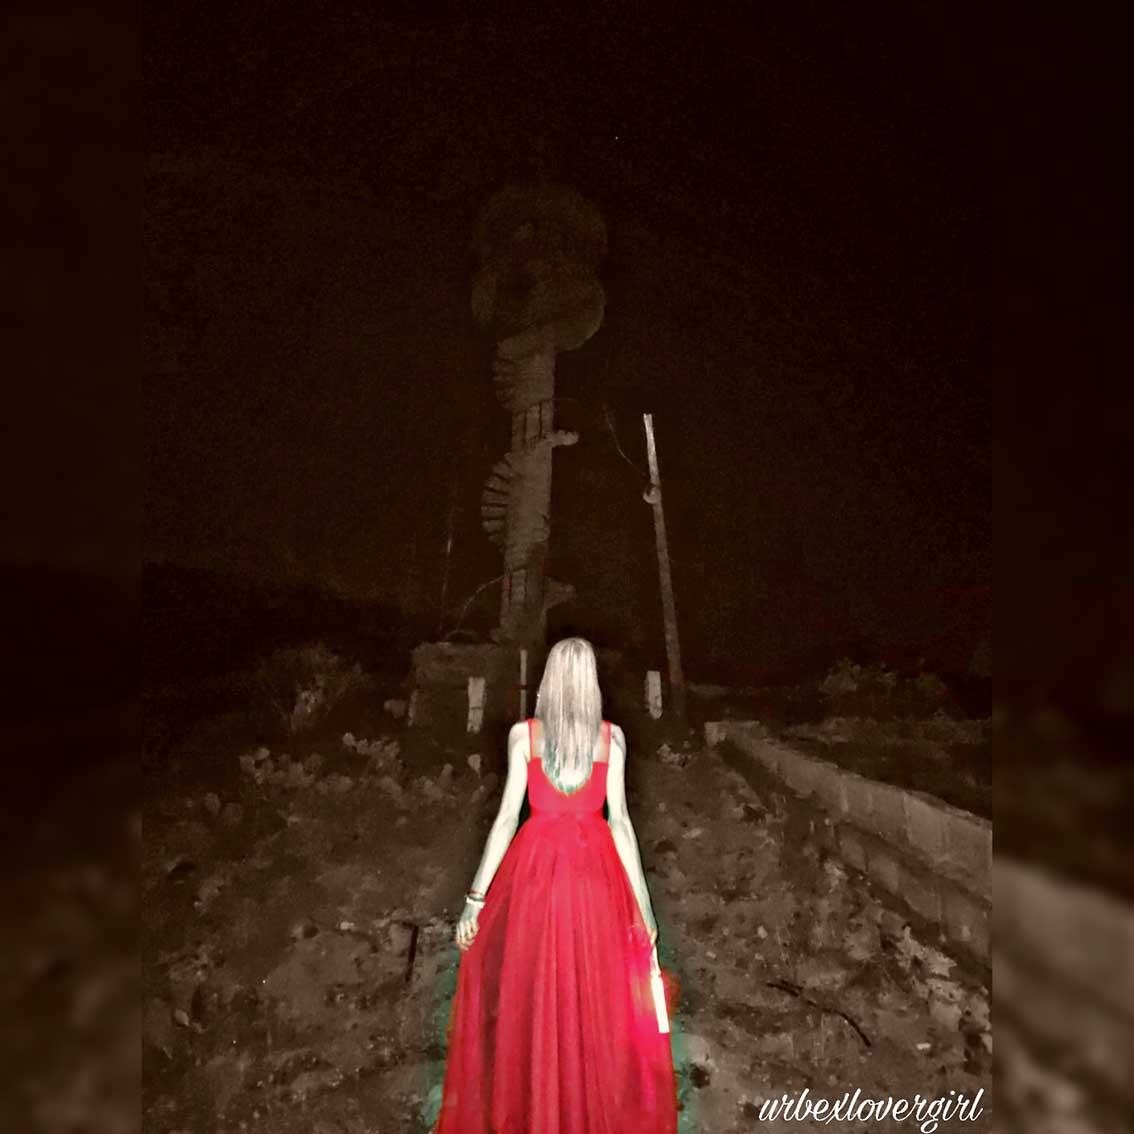 Urbex-Lover-Girl-se-acerca-a-una-escalera